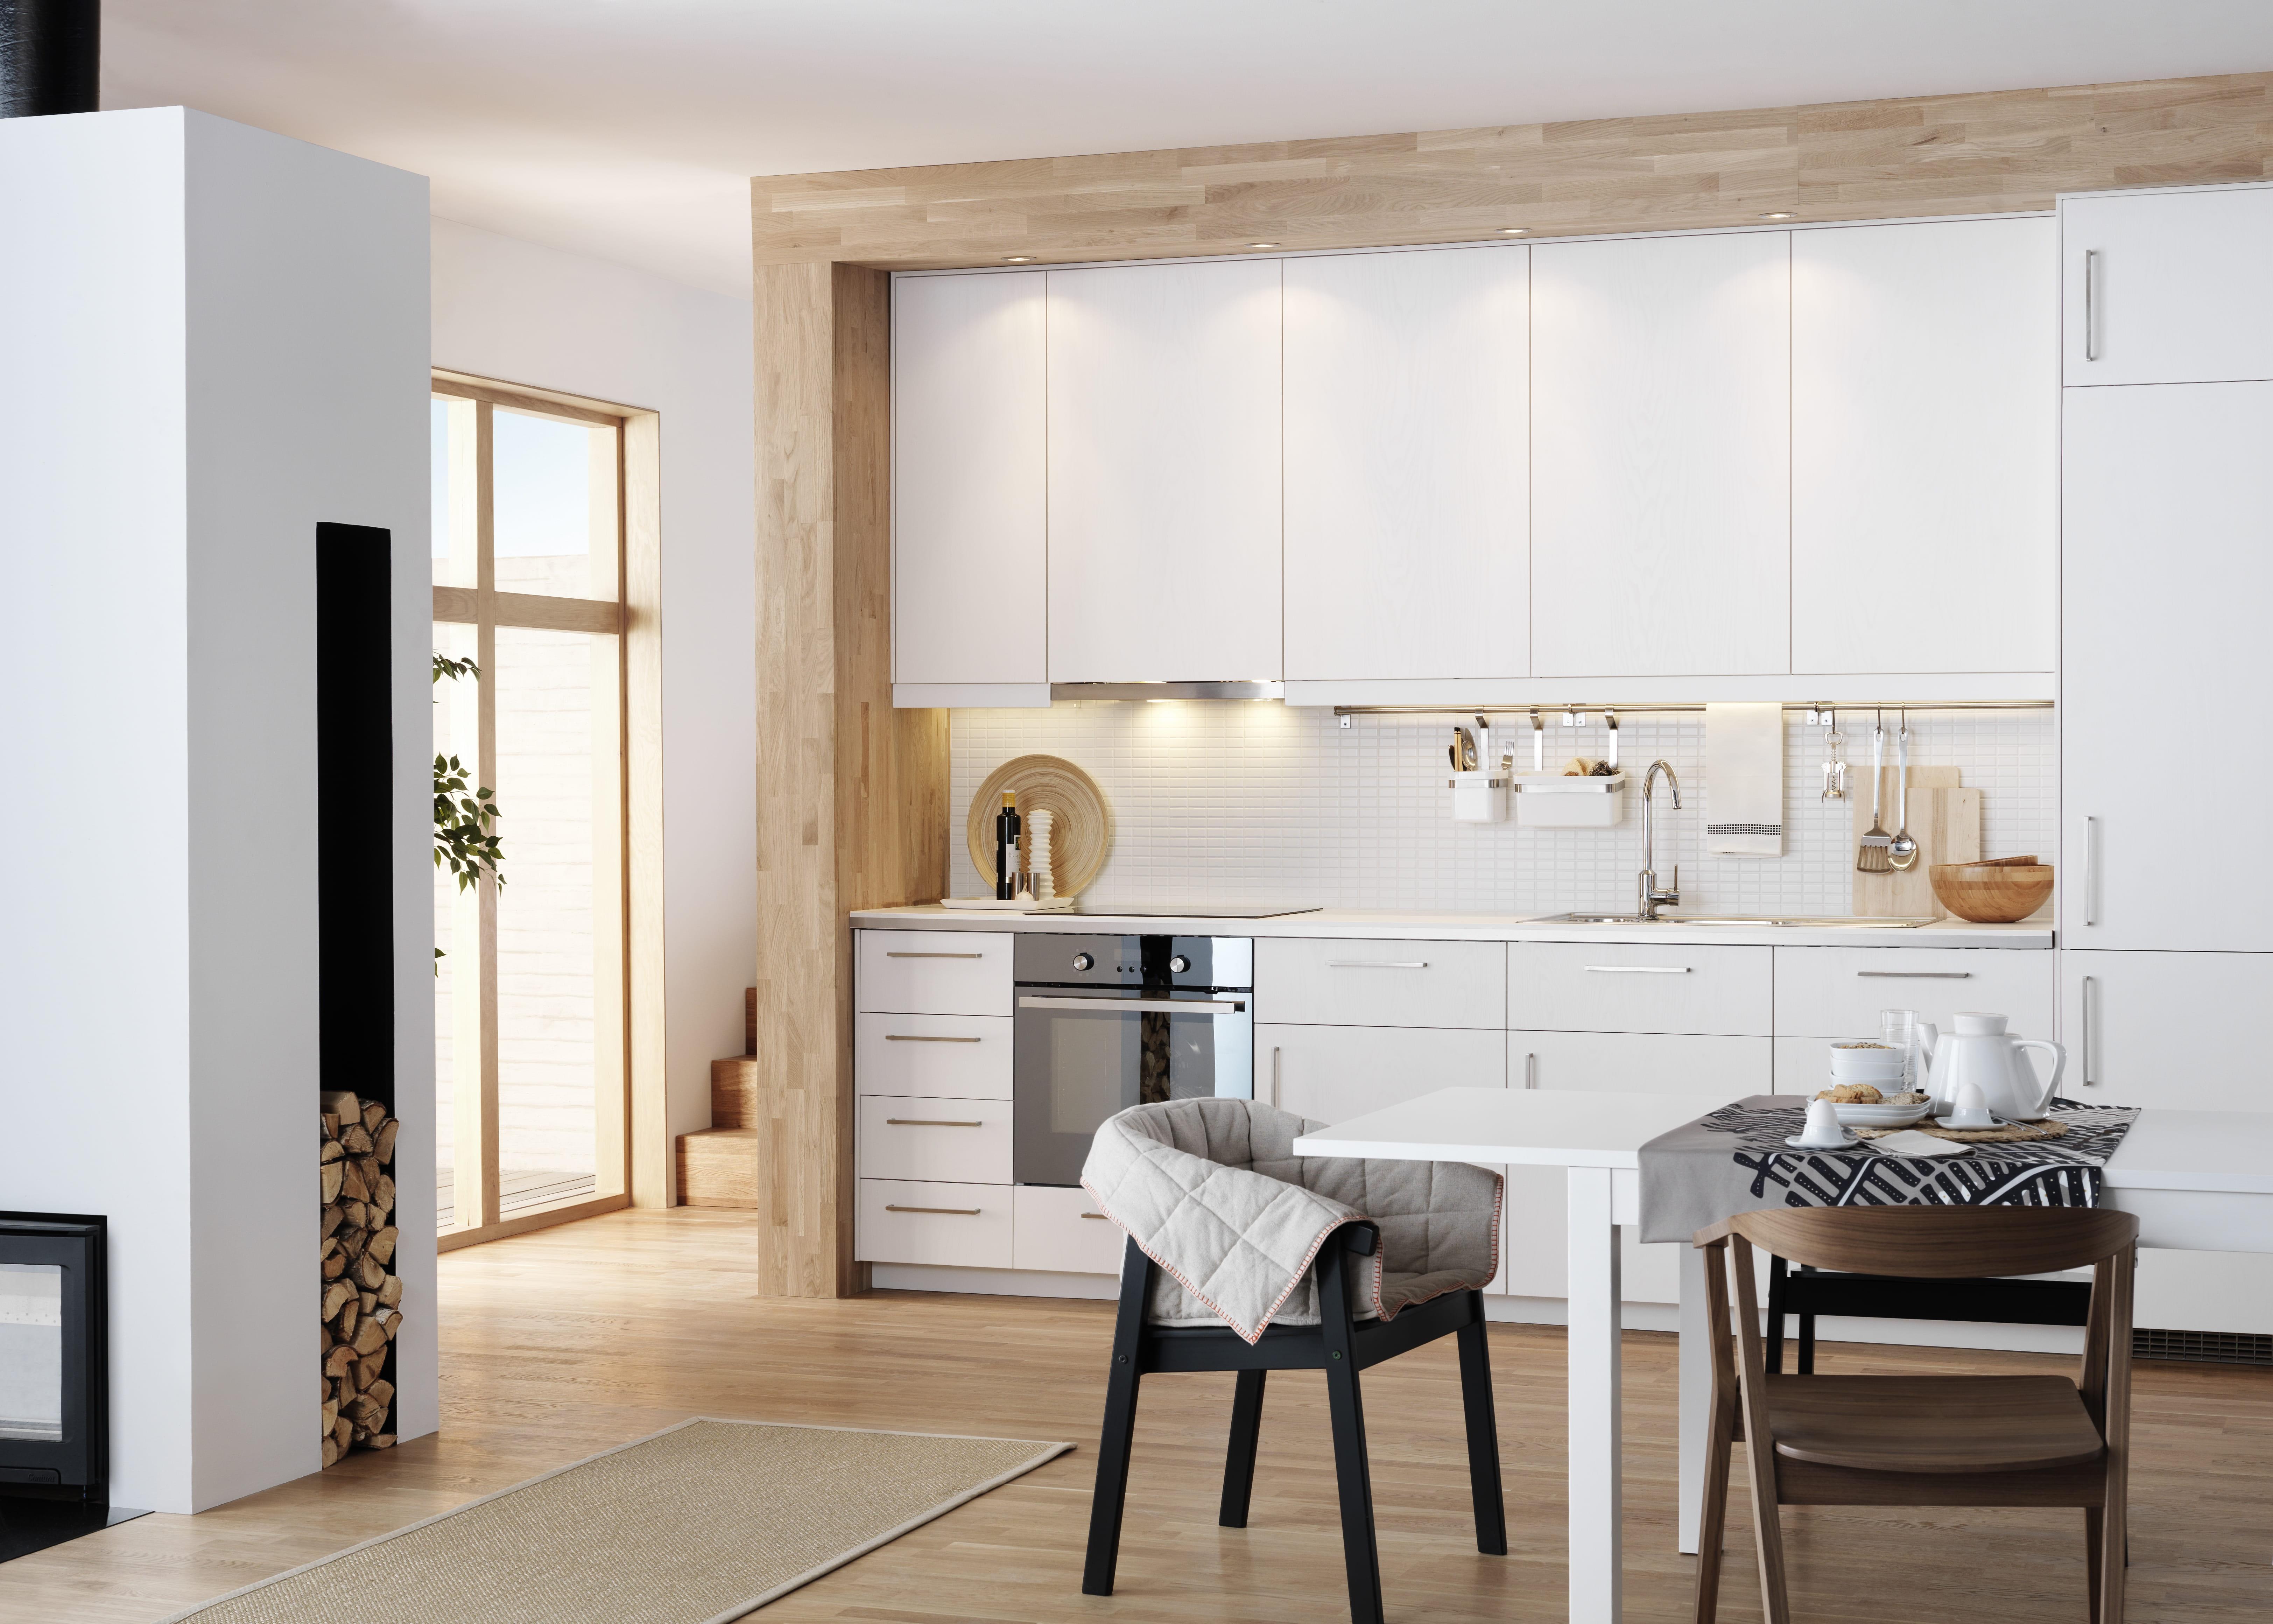 Cuisine Metod  Râsdal IKEA  Cuisine  32 nouveautés faciles à